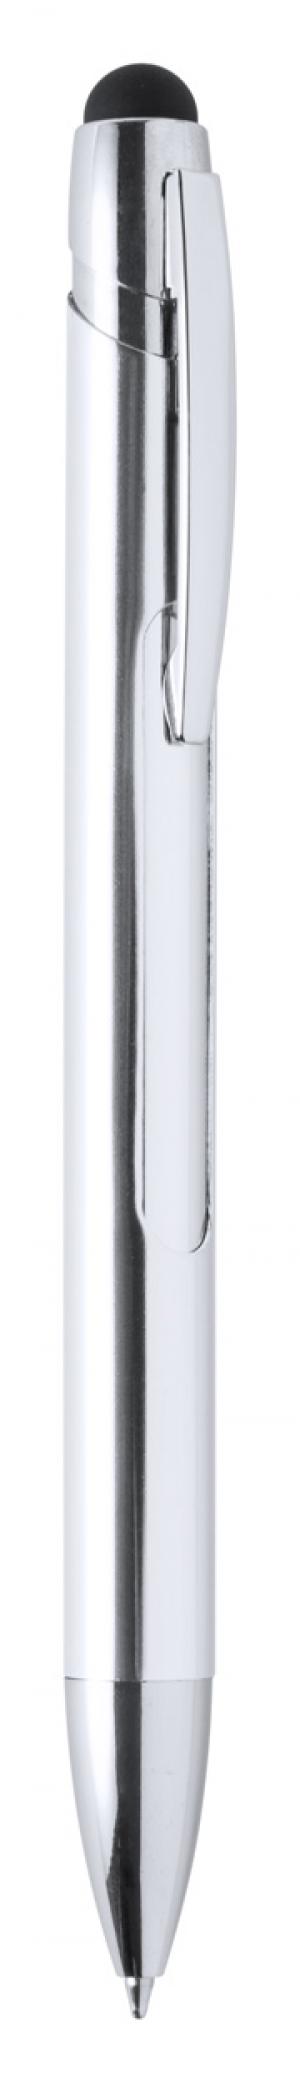 Verslo dovanos Norwey (touch ballpoint pen)